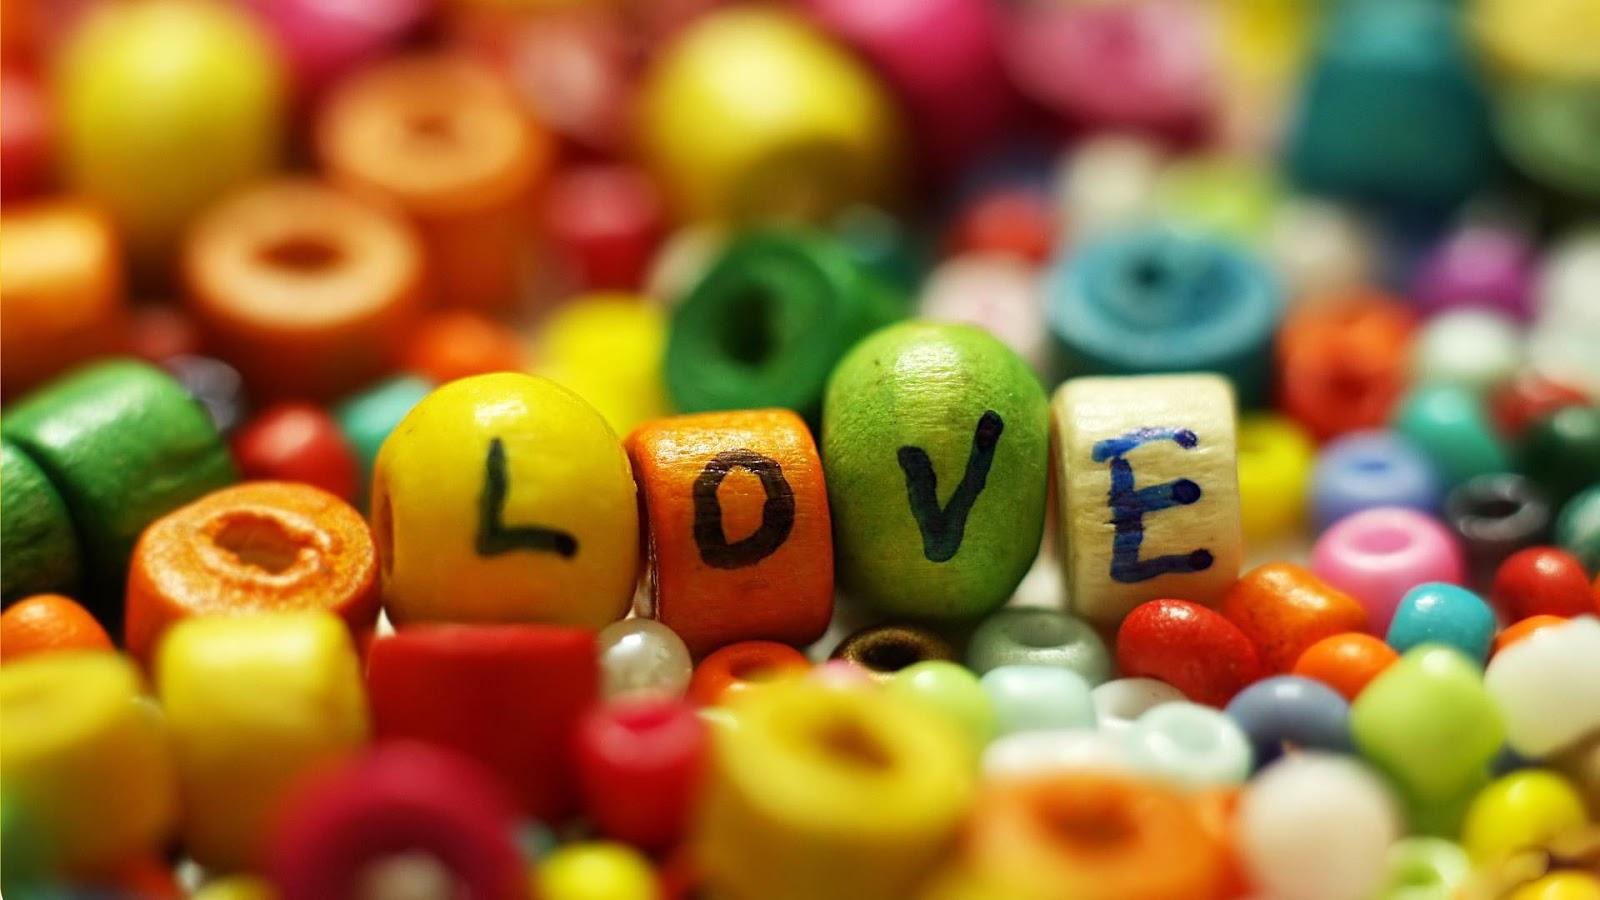 Image Of Love Quotes Wallpaper Hd Desktop Download Free 1920x1080